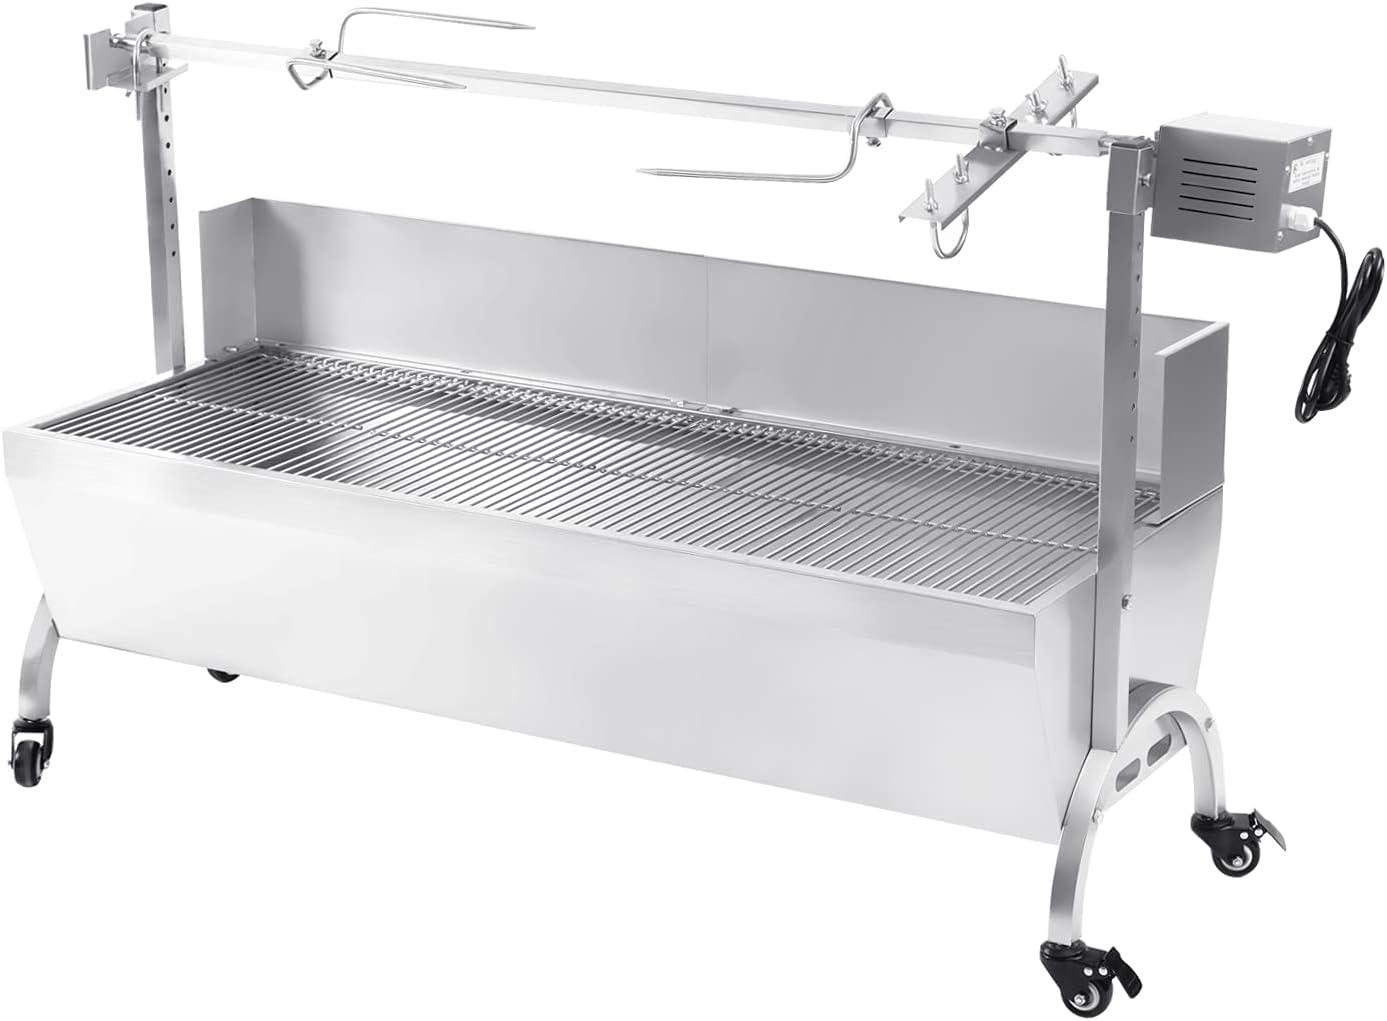 Samger Stainless Steel Rotisserie Roaster Translated Rotisser latest 45 20W Inches